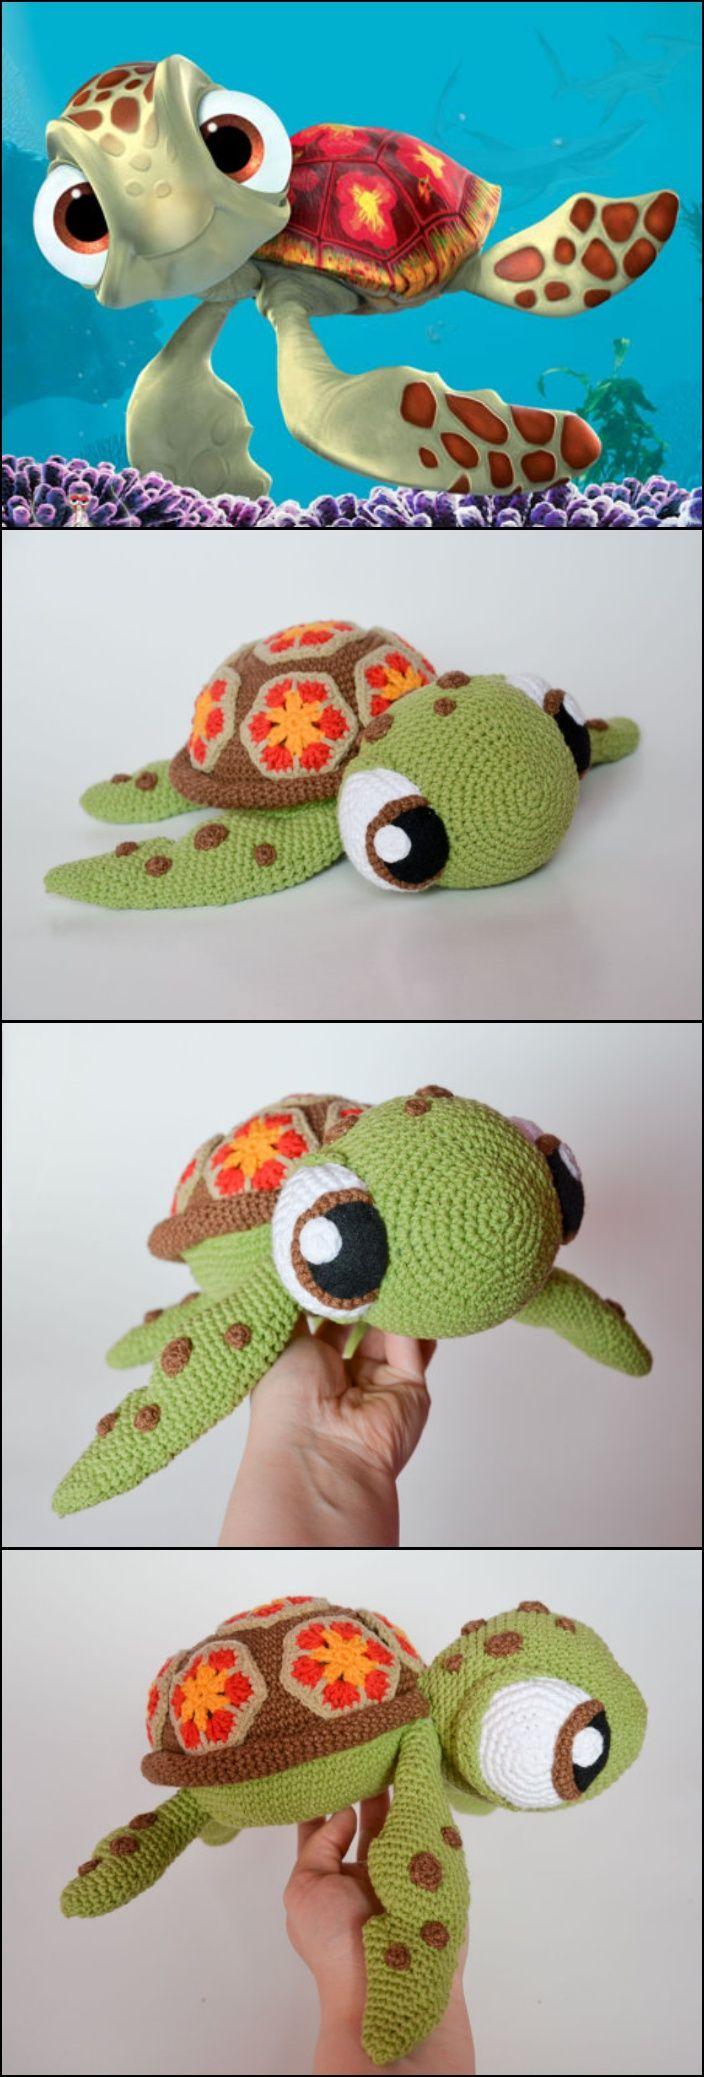 Finding Dory Crochet / Knitting Patterns #amigurumi